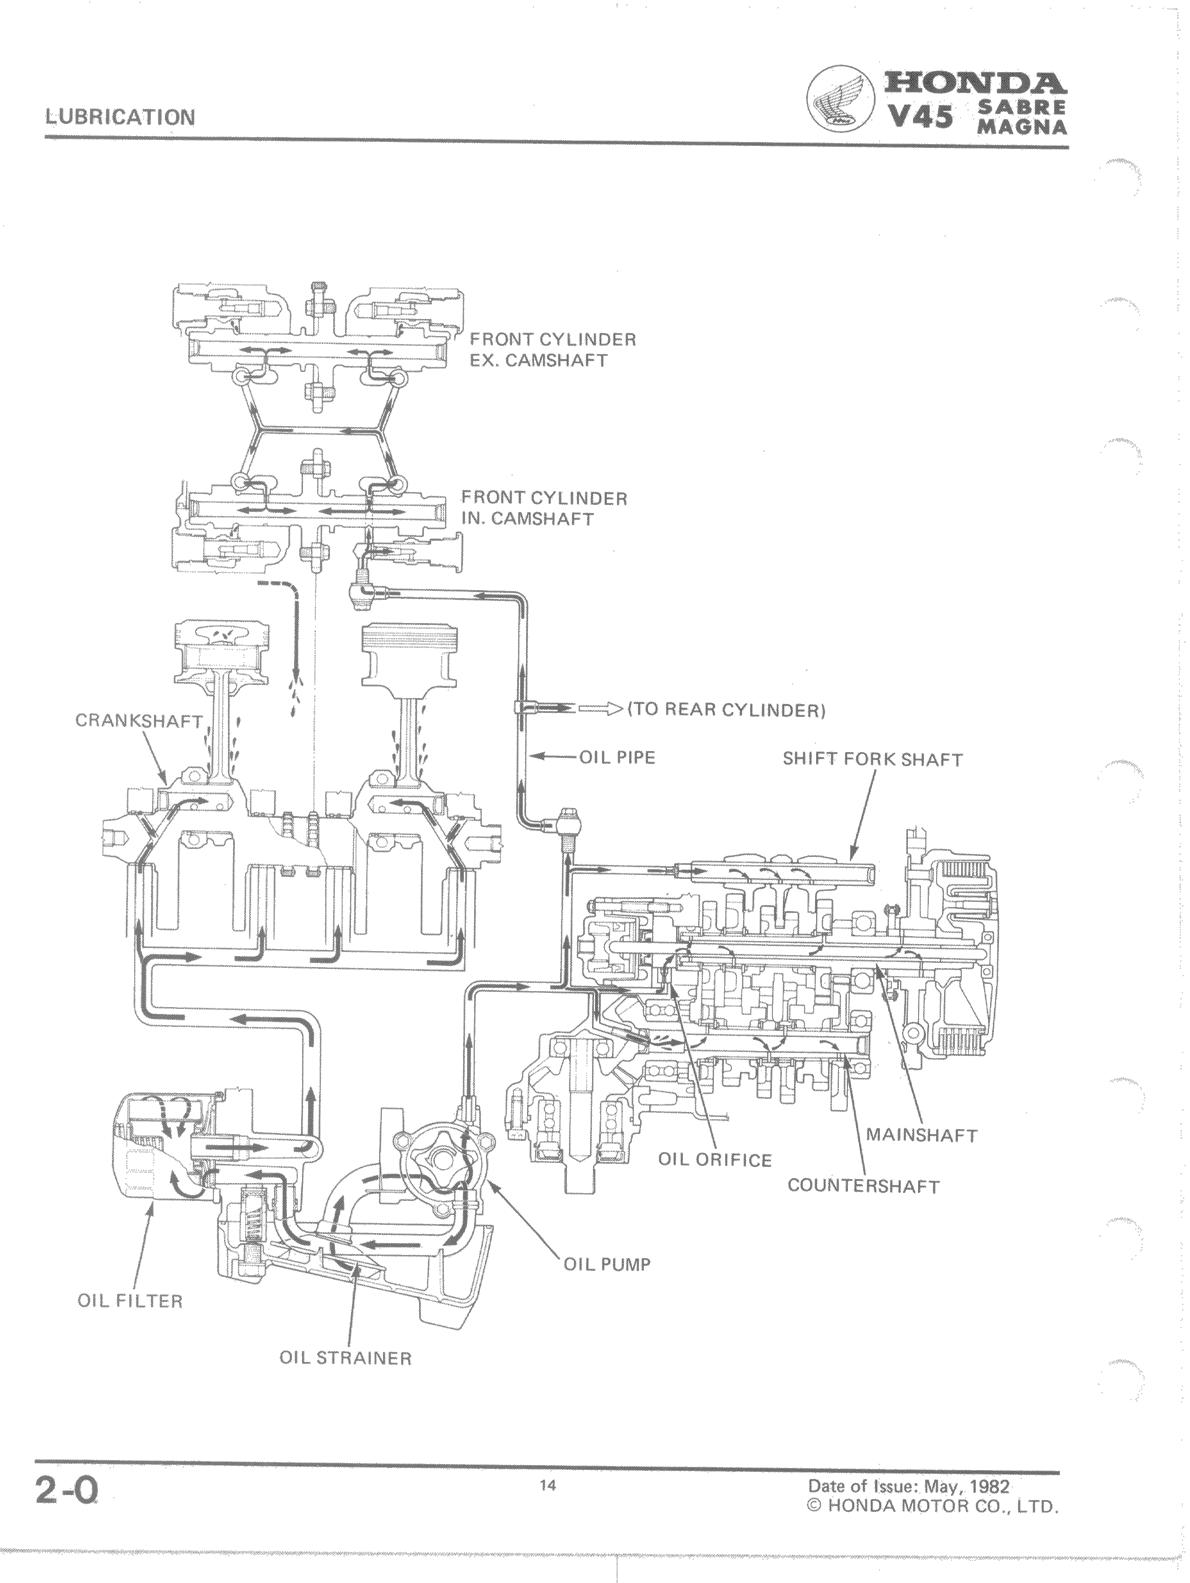 vf750c shop manual  www.mittelstaedt.us